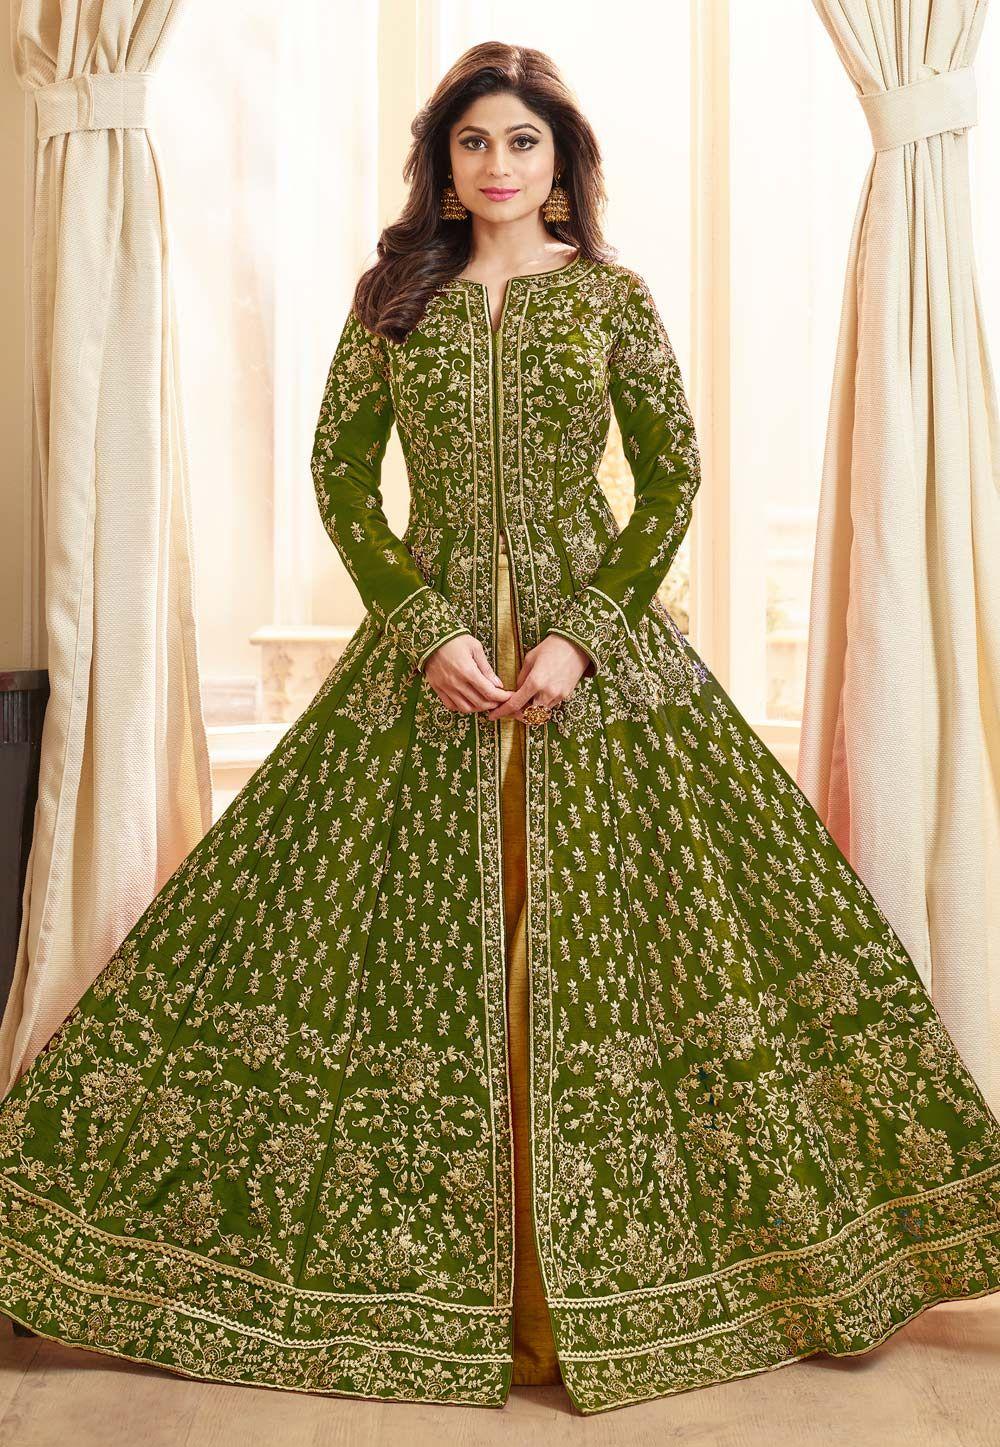 bdfec4bff3 Buy Shamita Shetty Green Silk Indo Western Lehenga Choli 163644 online at  best price from vast collection of Lehenga Choli and Chaniya Choli at ...